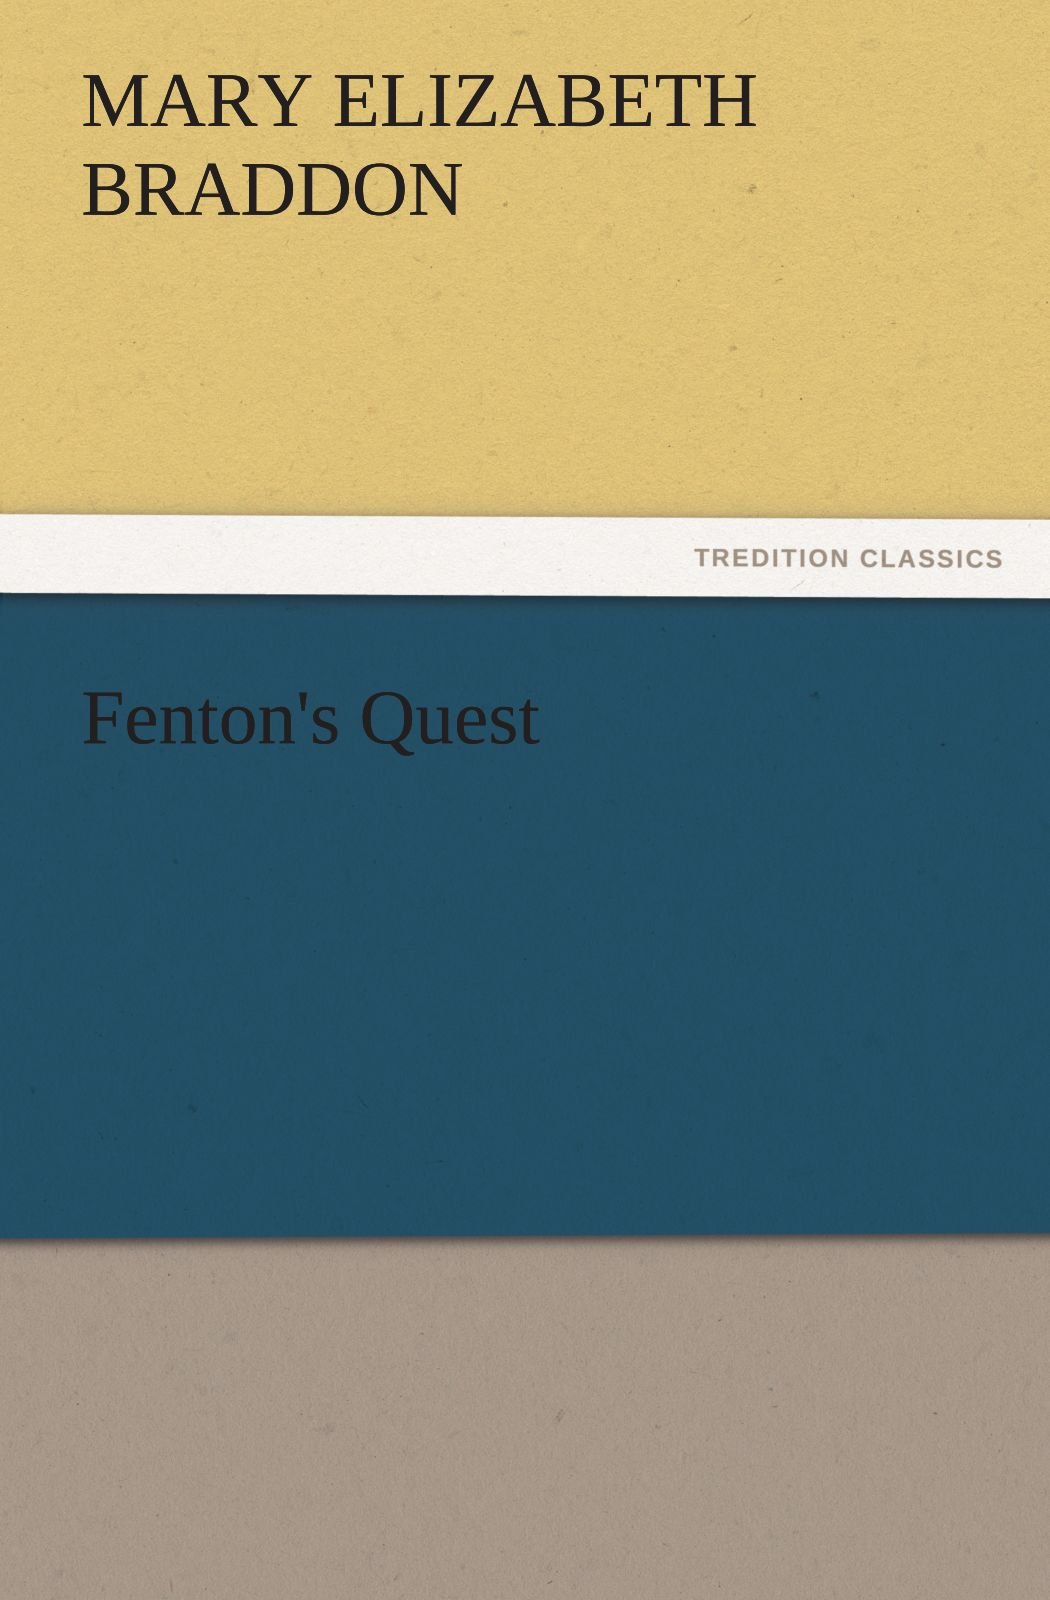 Fenton's Quest (TREDITION CLASSICS) pdf epub